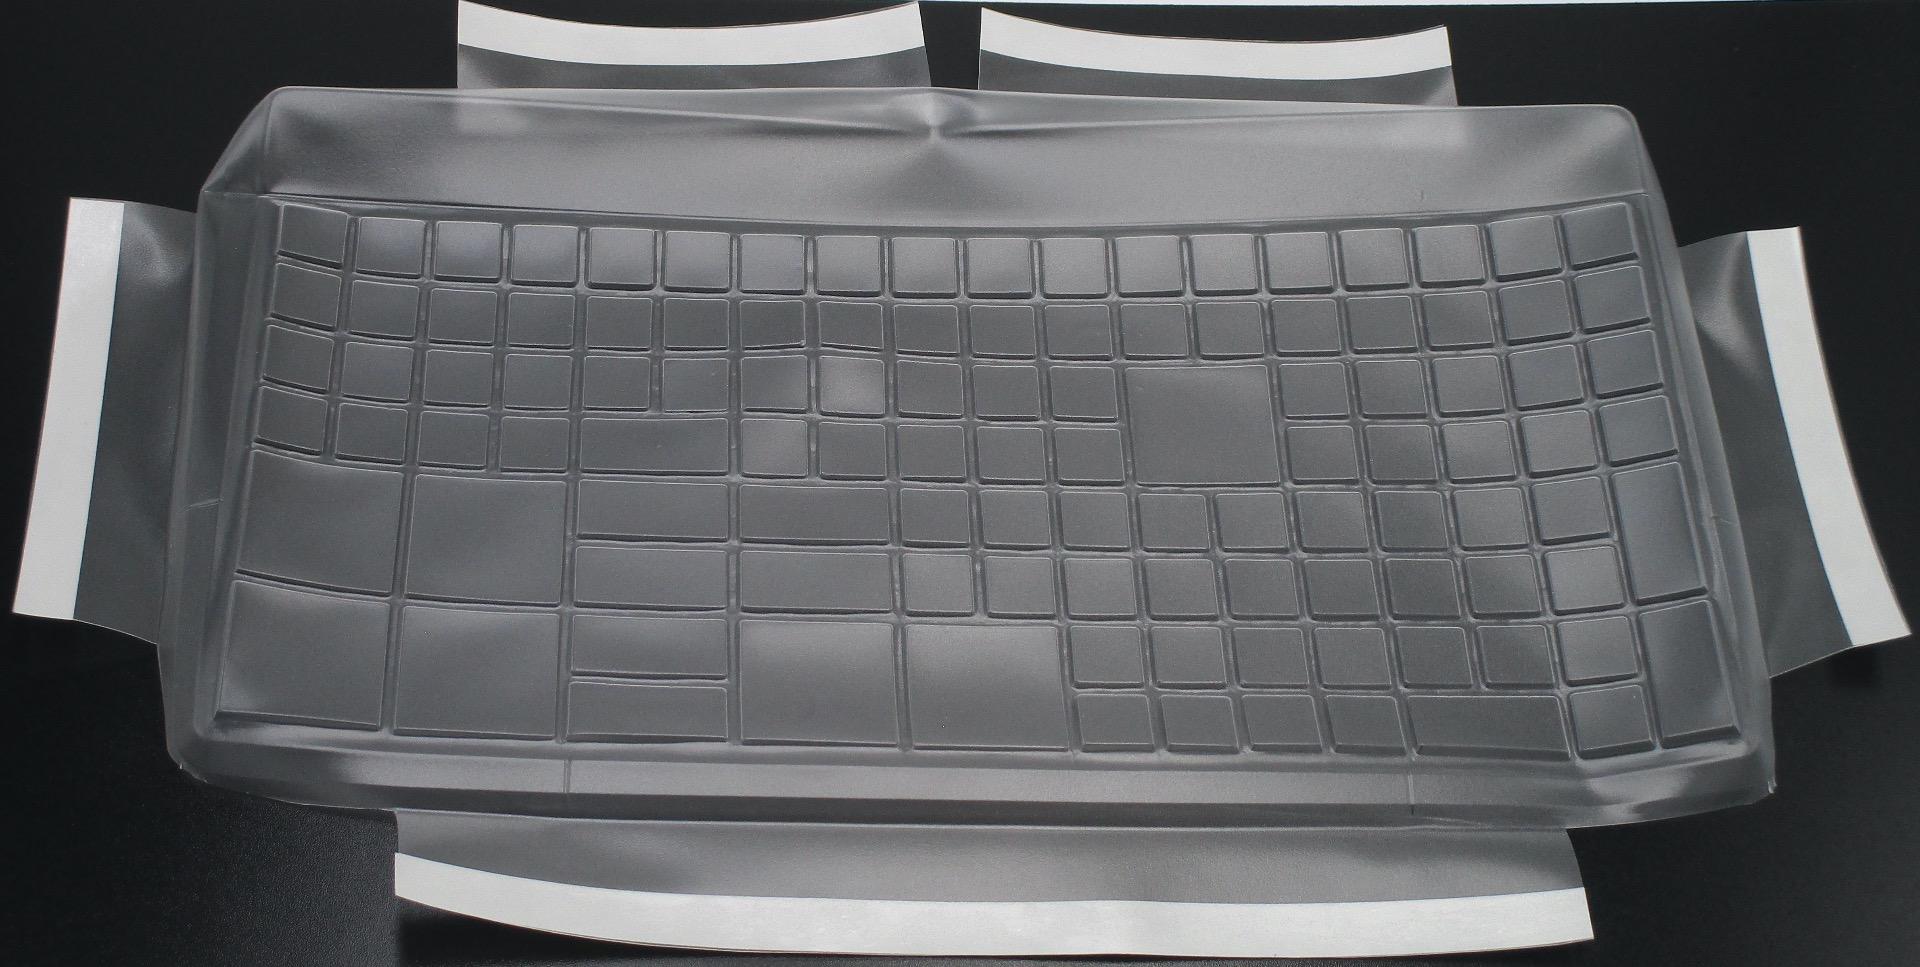 Cherry SPOS G86-3400EUADAA (Custom) Keyboard Cover